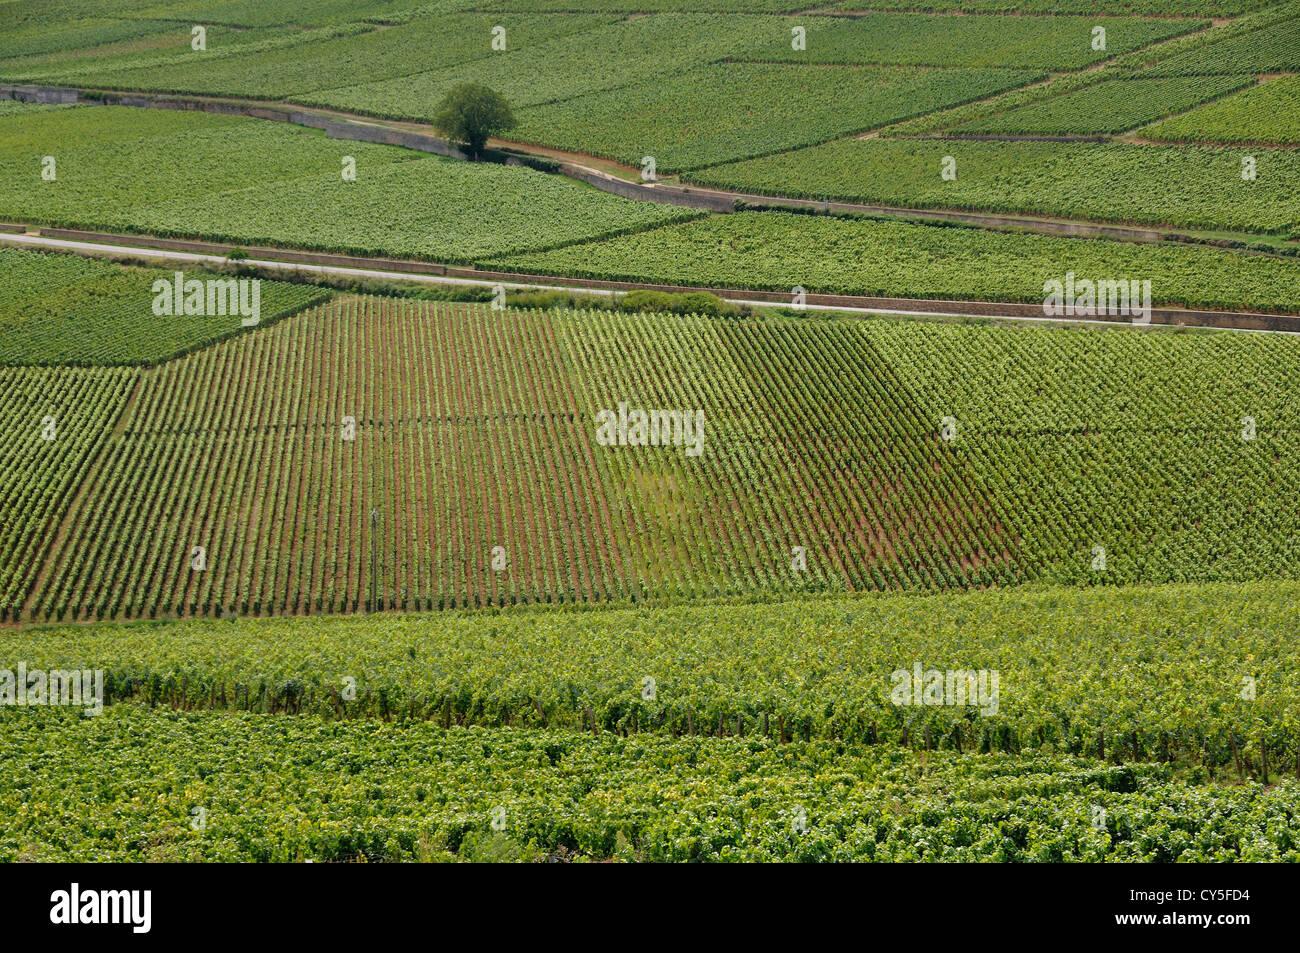 Cotes de Beaune vineyard, Cote d'Or, France, Europe - Stock Image